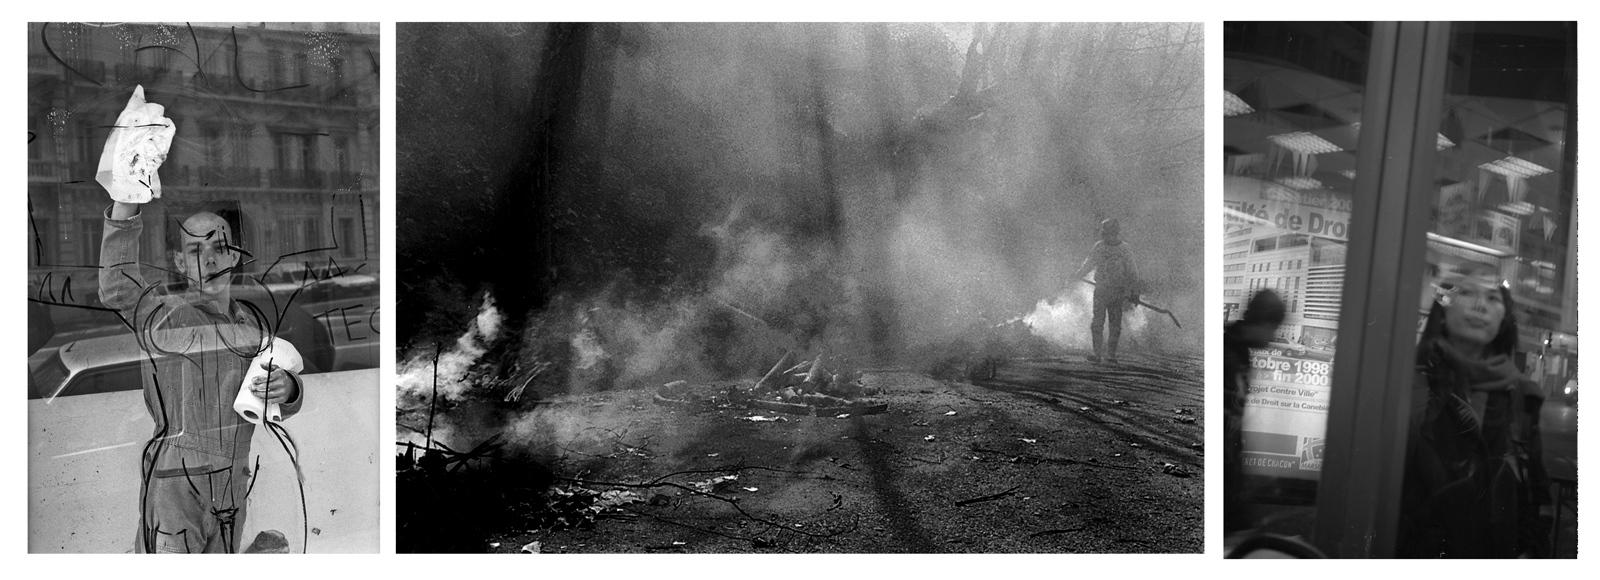 Art and Documentary Photography - Loading 049_Marseille___Fabio_Sgroi.jpg